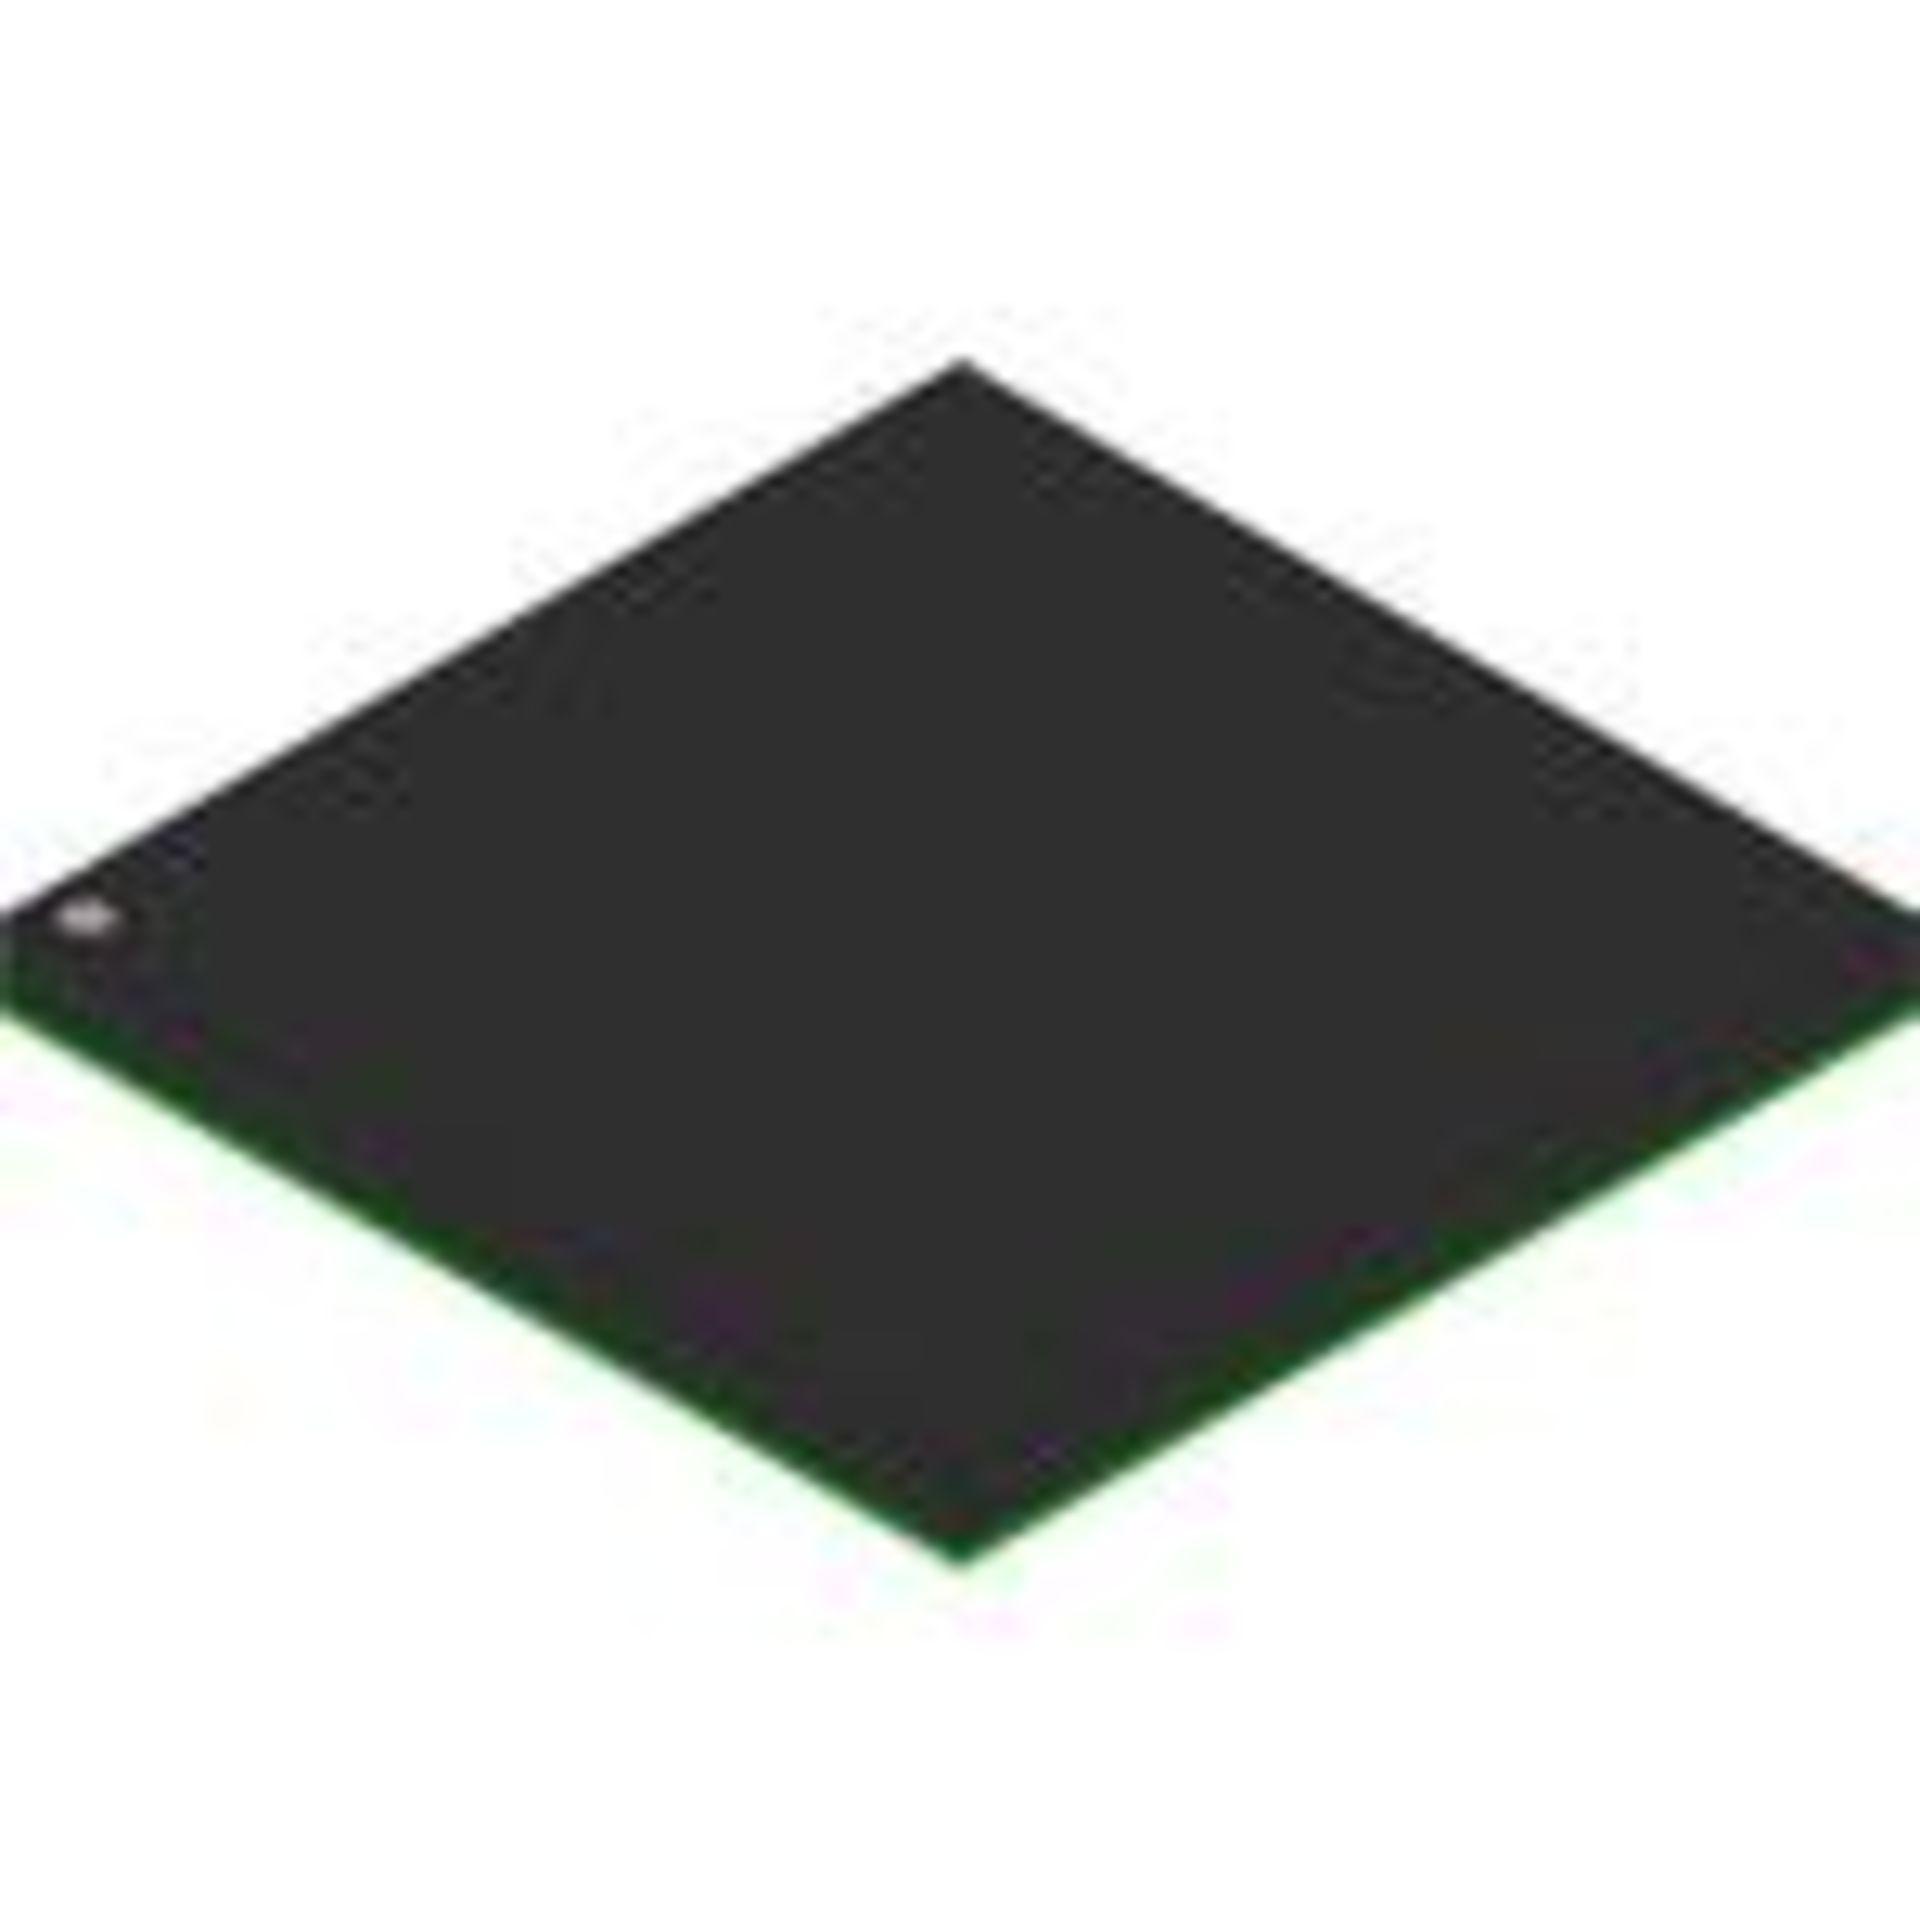 Microchip Technology SoC FPGA A2F500M3G-FGG484, Qty 111 AND A2F500M3G-FGG484I, QTY 48, FPGA